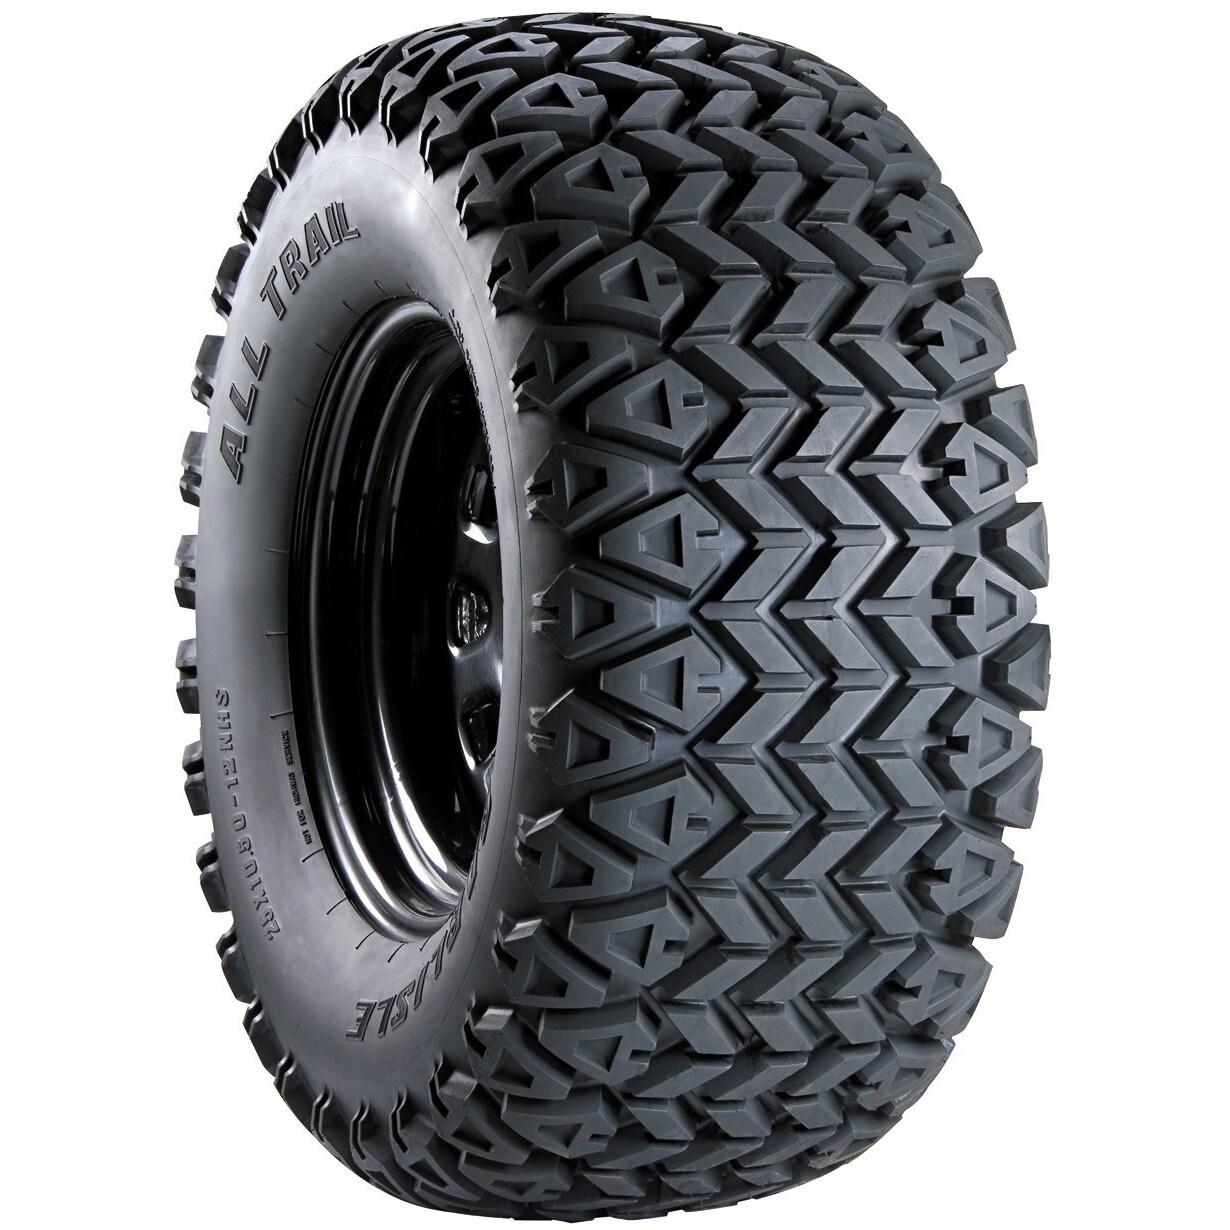 Carlisle All Trail ATV Tire - 25X800-12 LRB/4 ply (Black)